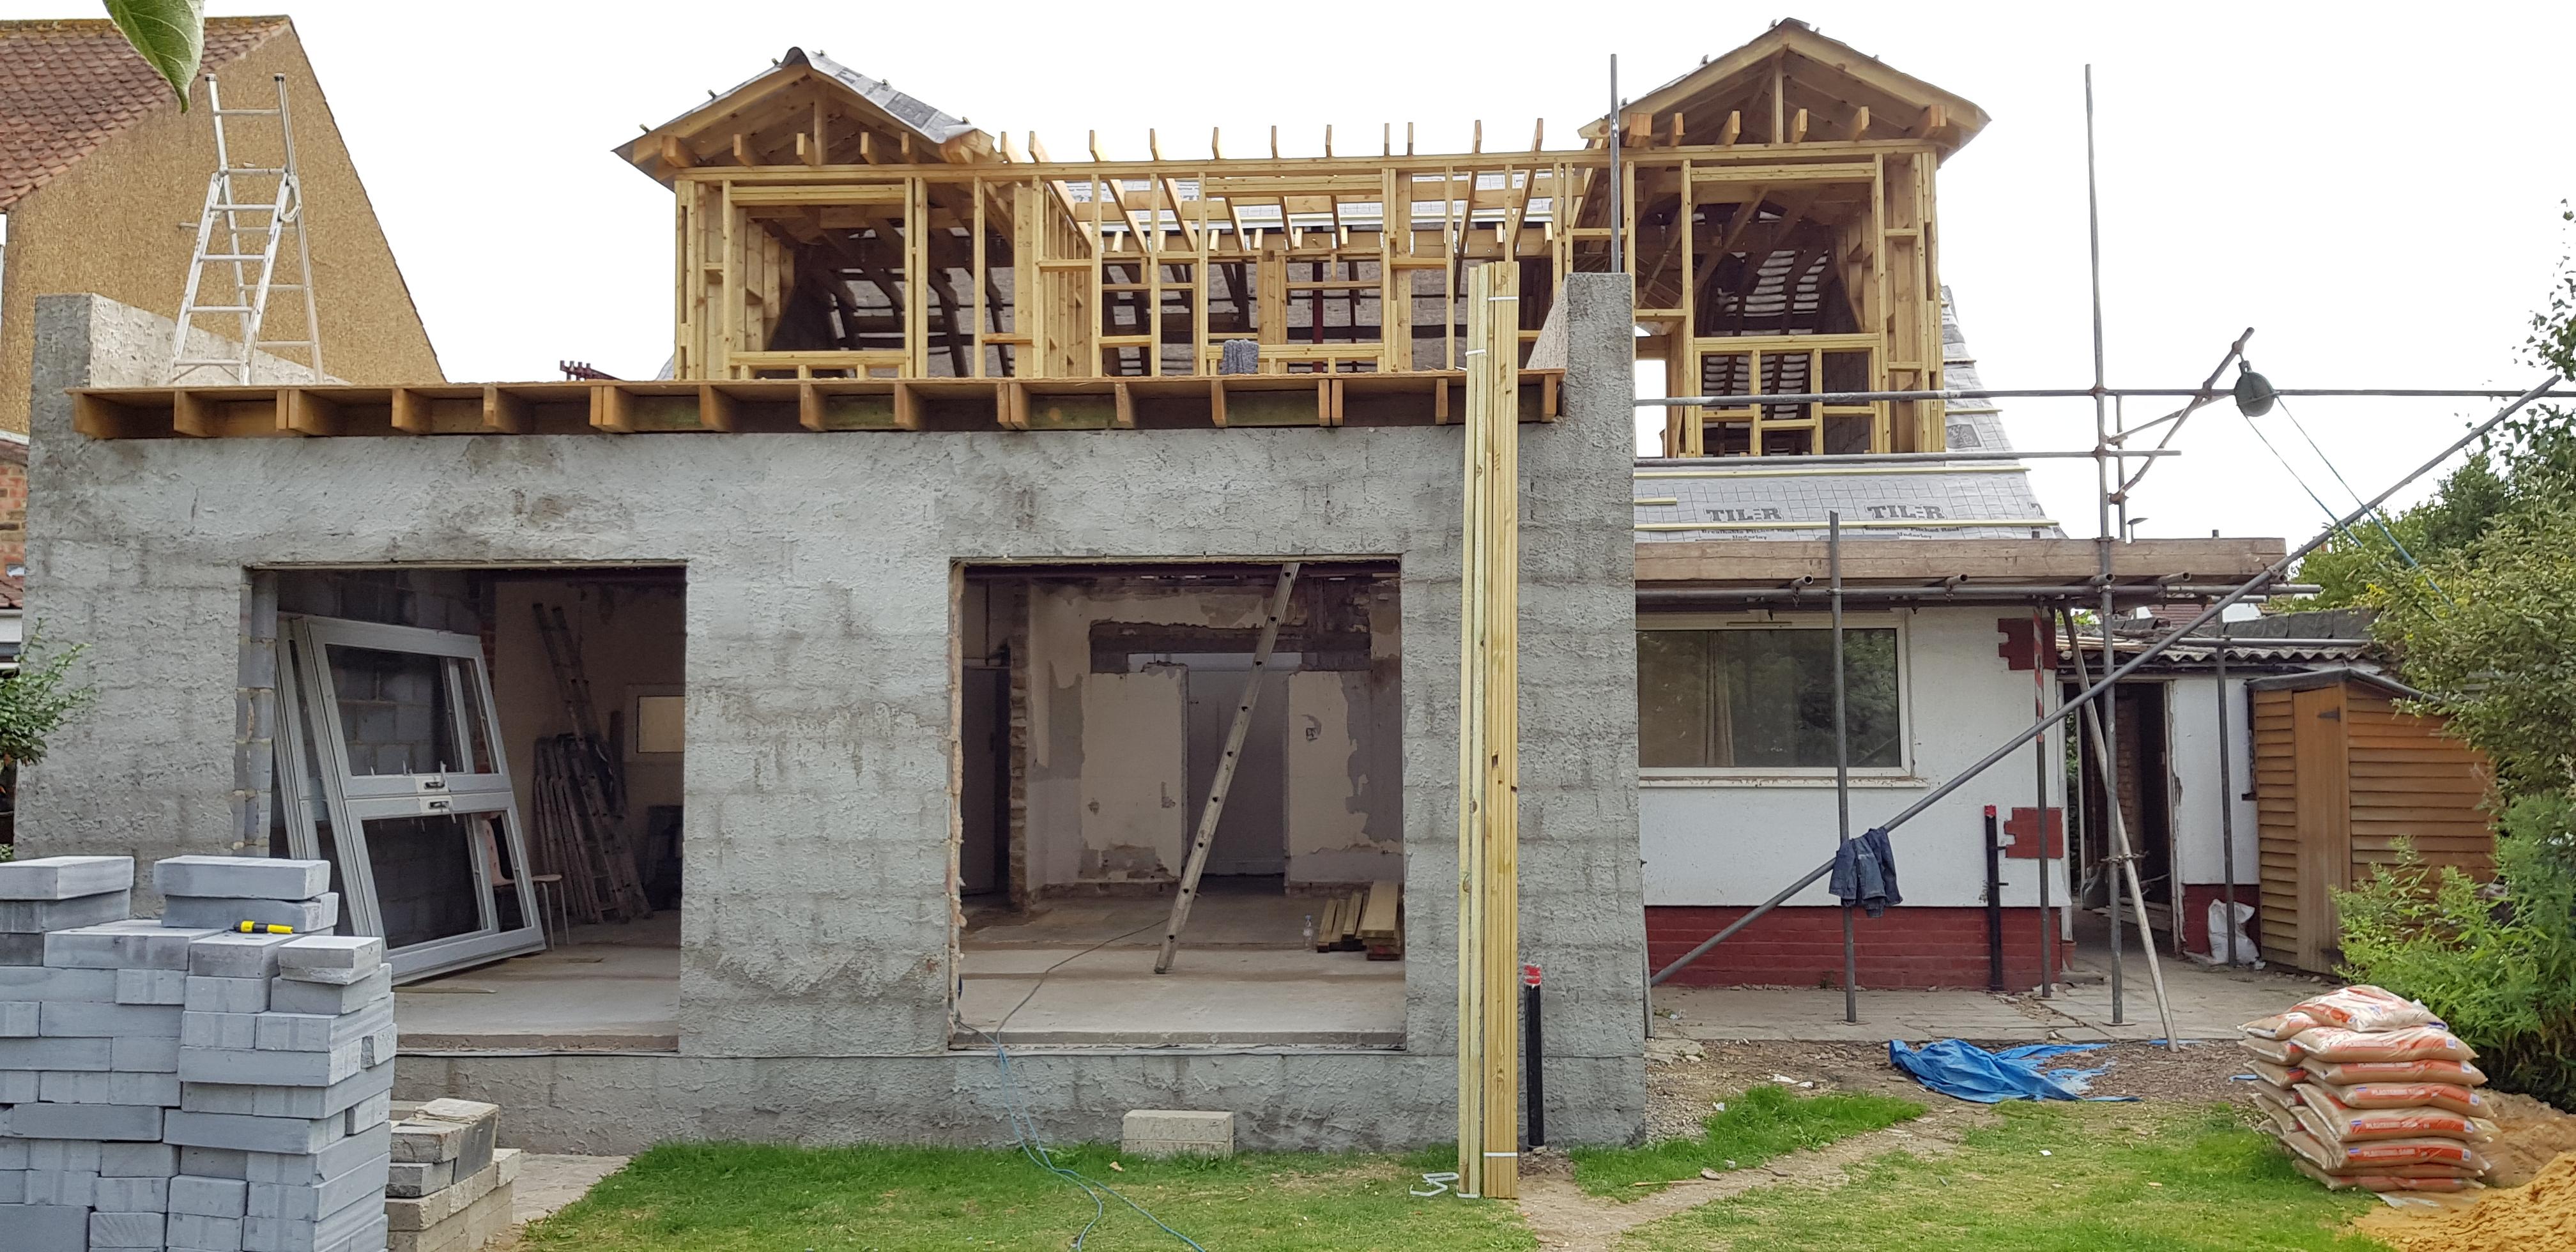 Property under construction.